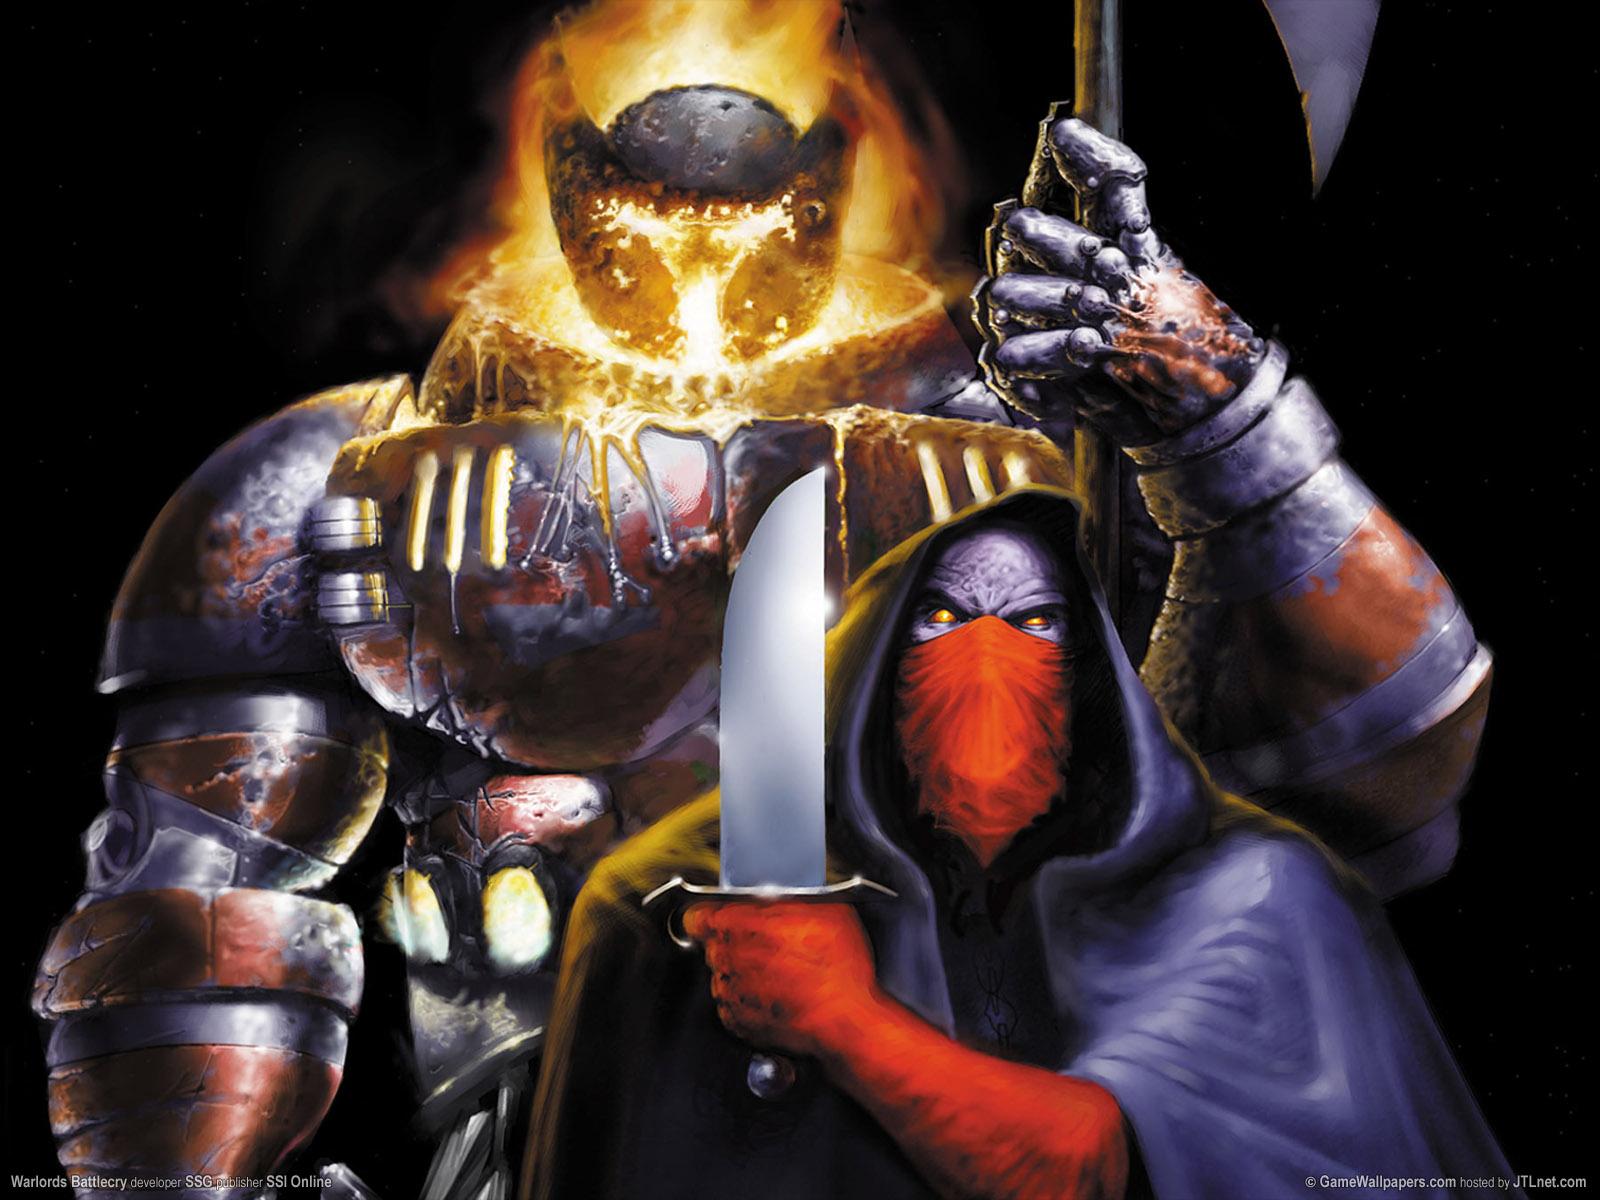 Encyklopedia Warlords Battlecry 2